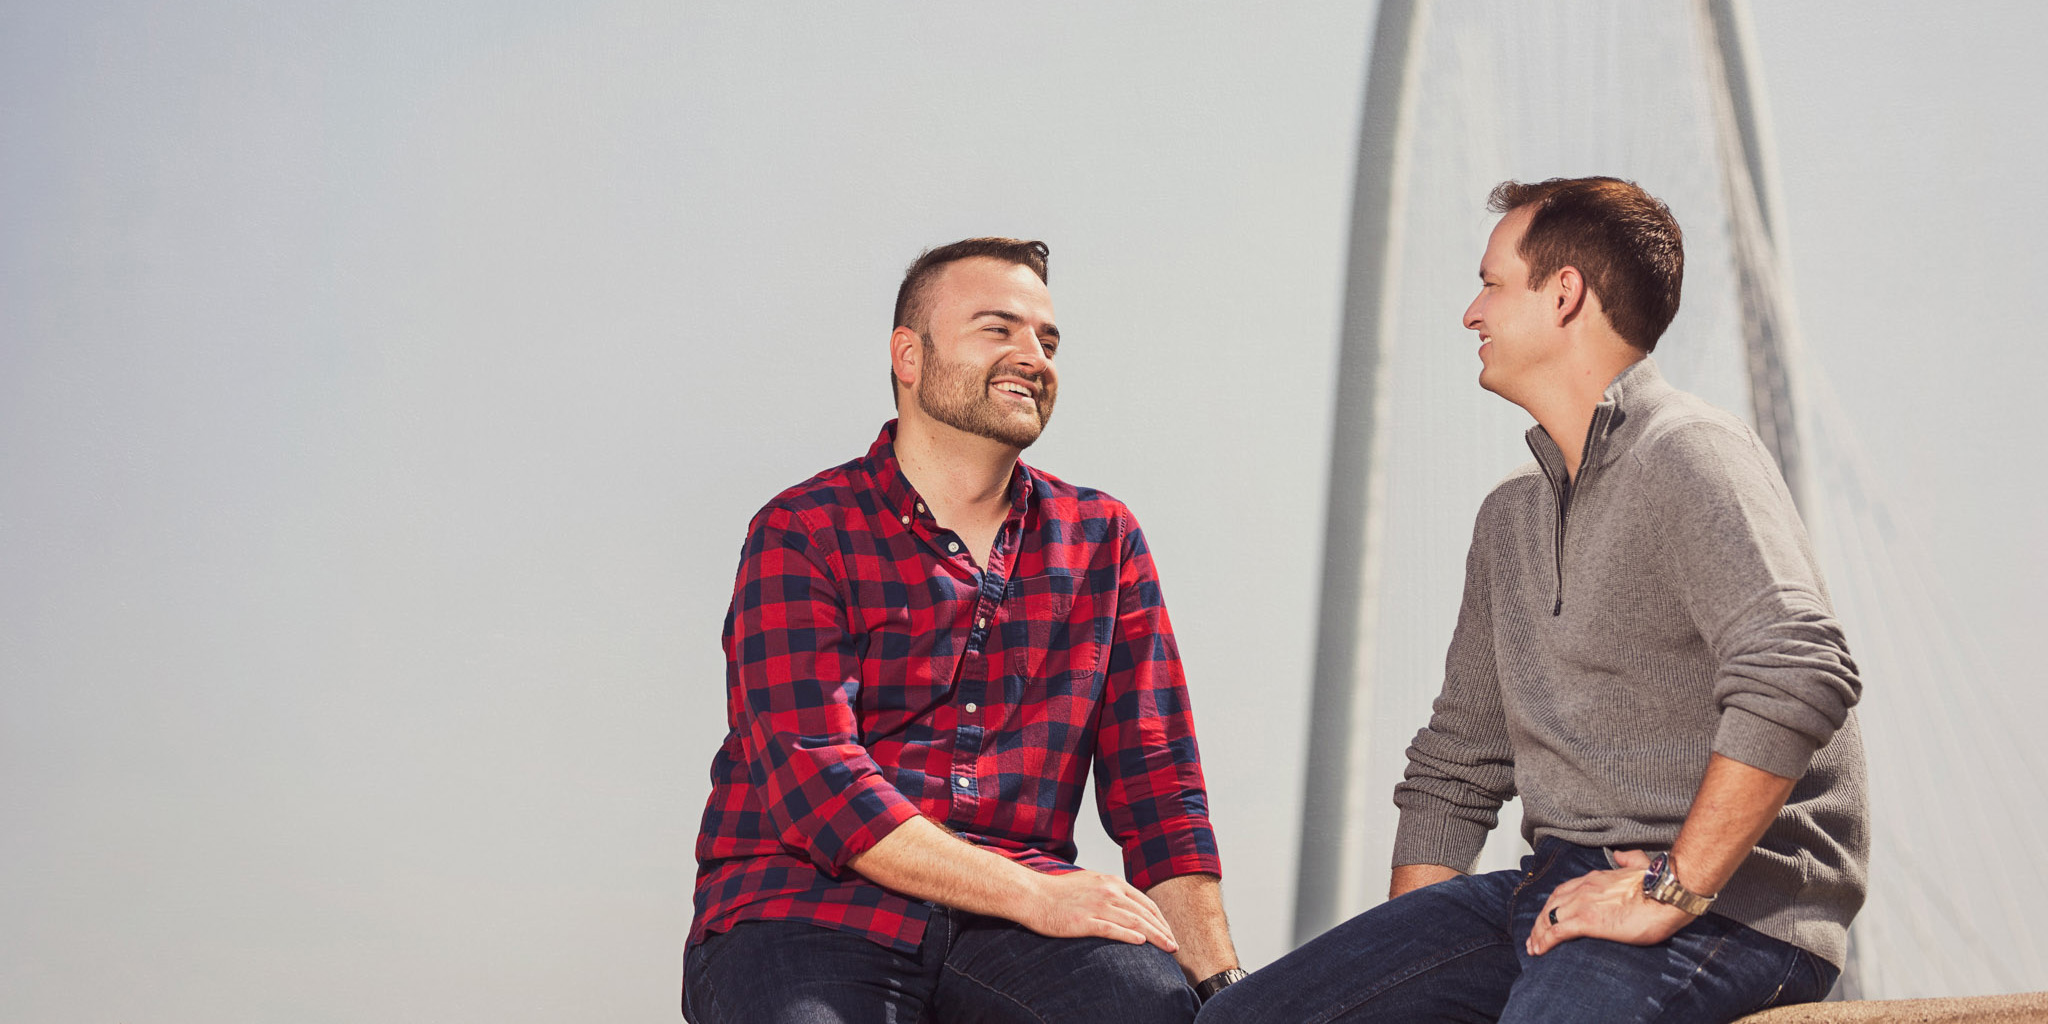 Matt + Bryan - Can't Help Falling In Love